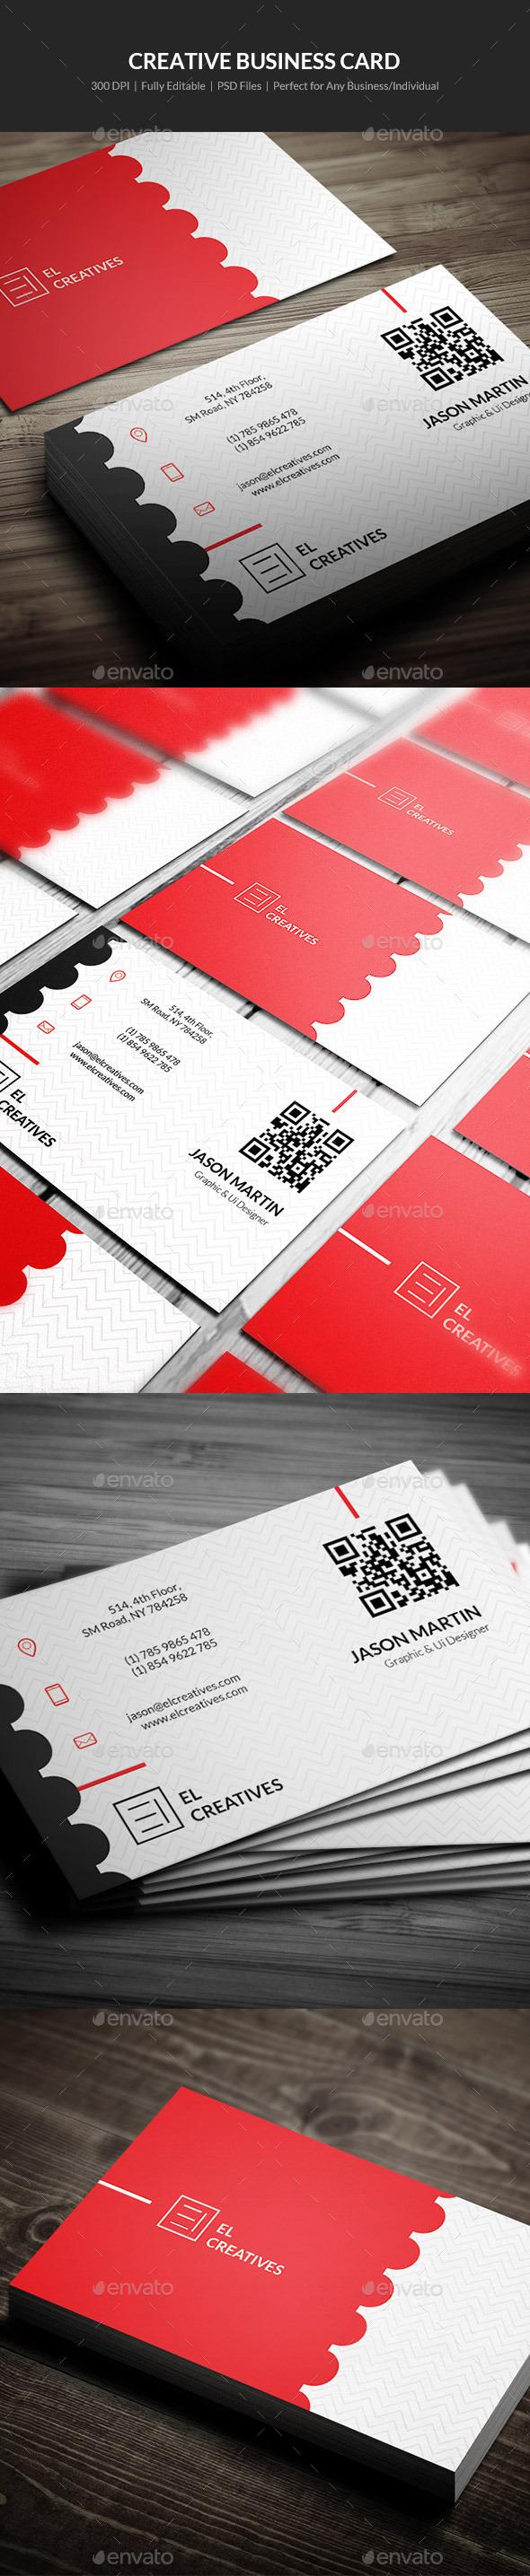 Creative Business Card -19 - Creative Business Cards